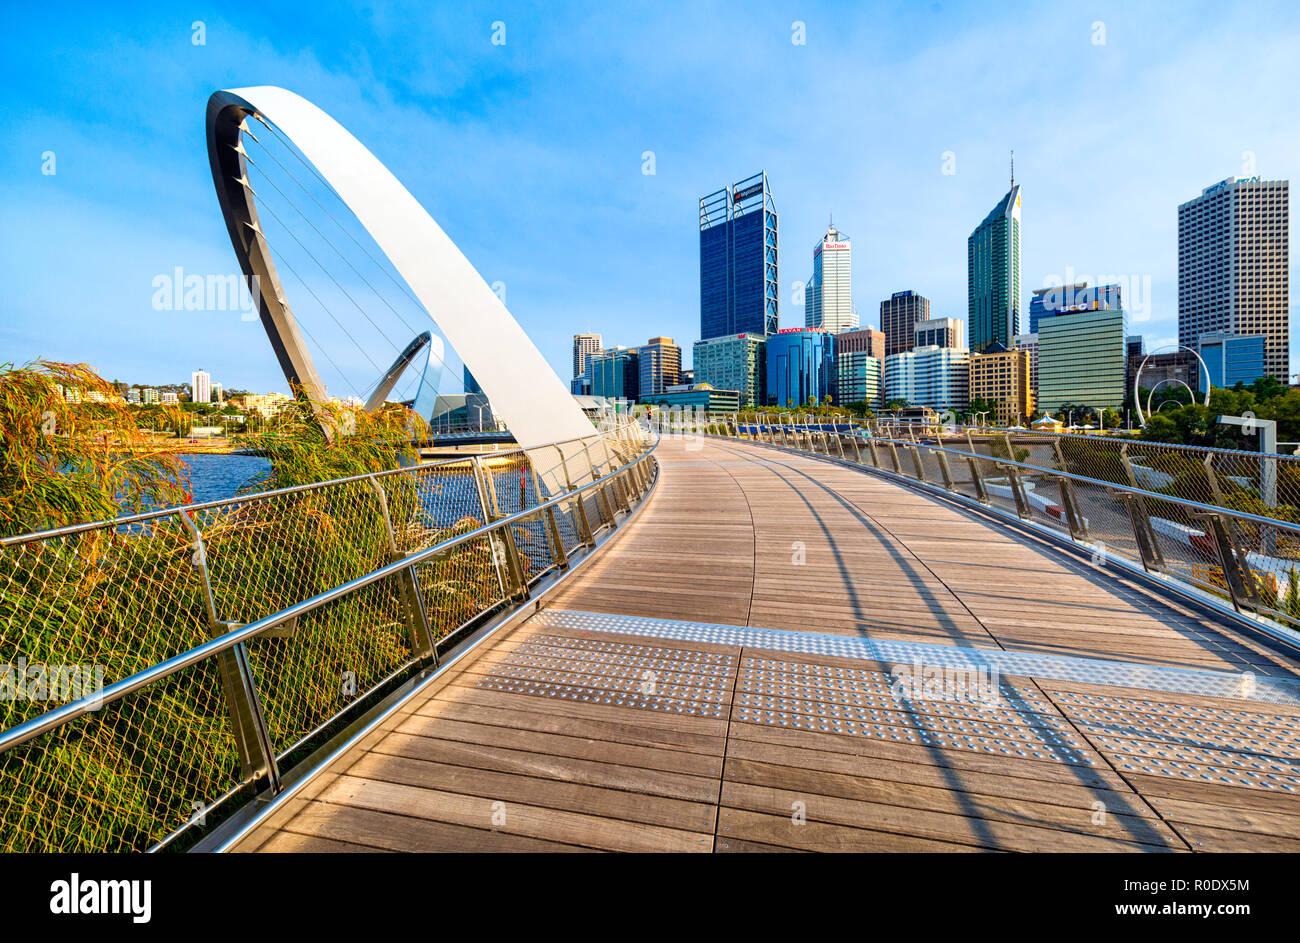 Elizabeth Quay Bridge overlooking Elizabeth Quay and the Perth city skyline. Perth, Western Australia - Stock Image